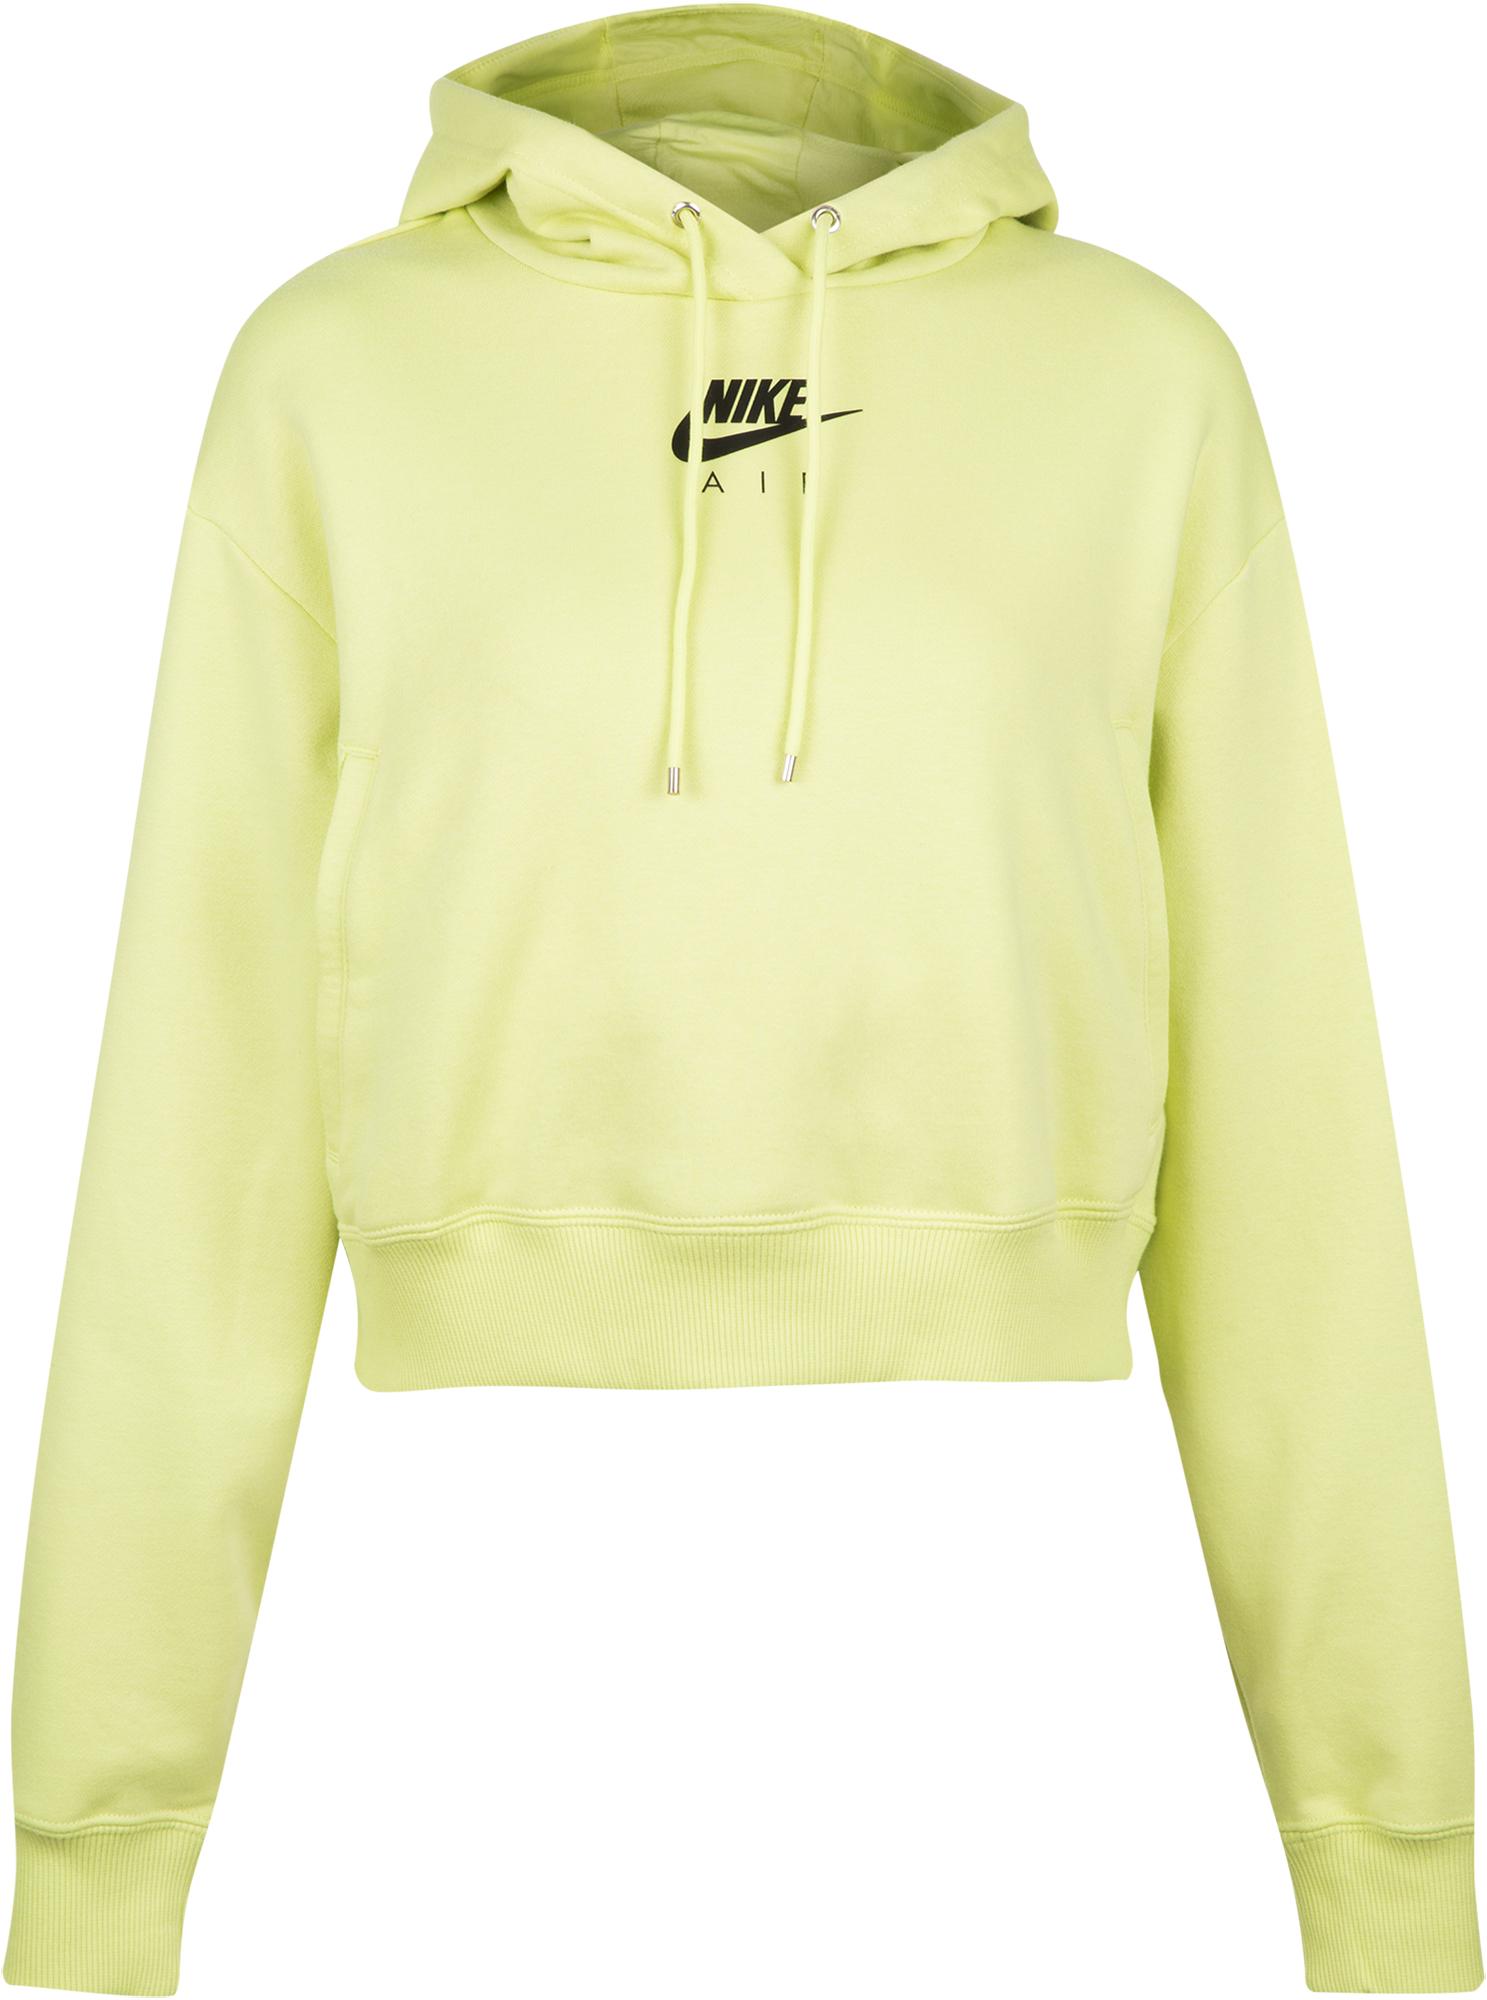 цена Nike Худи женская Nike Air, размер 42-44 онлайн в 2017 году